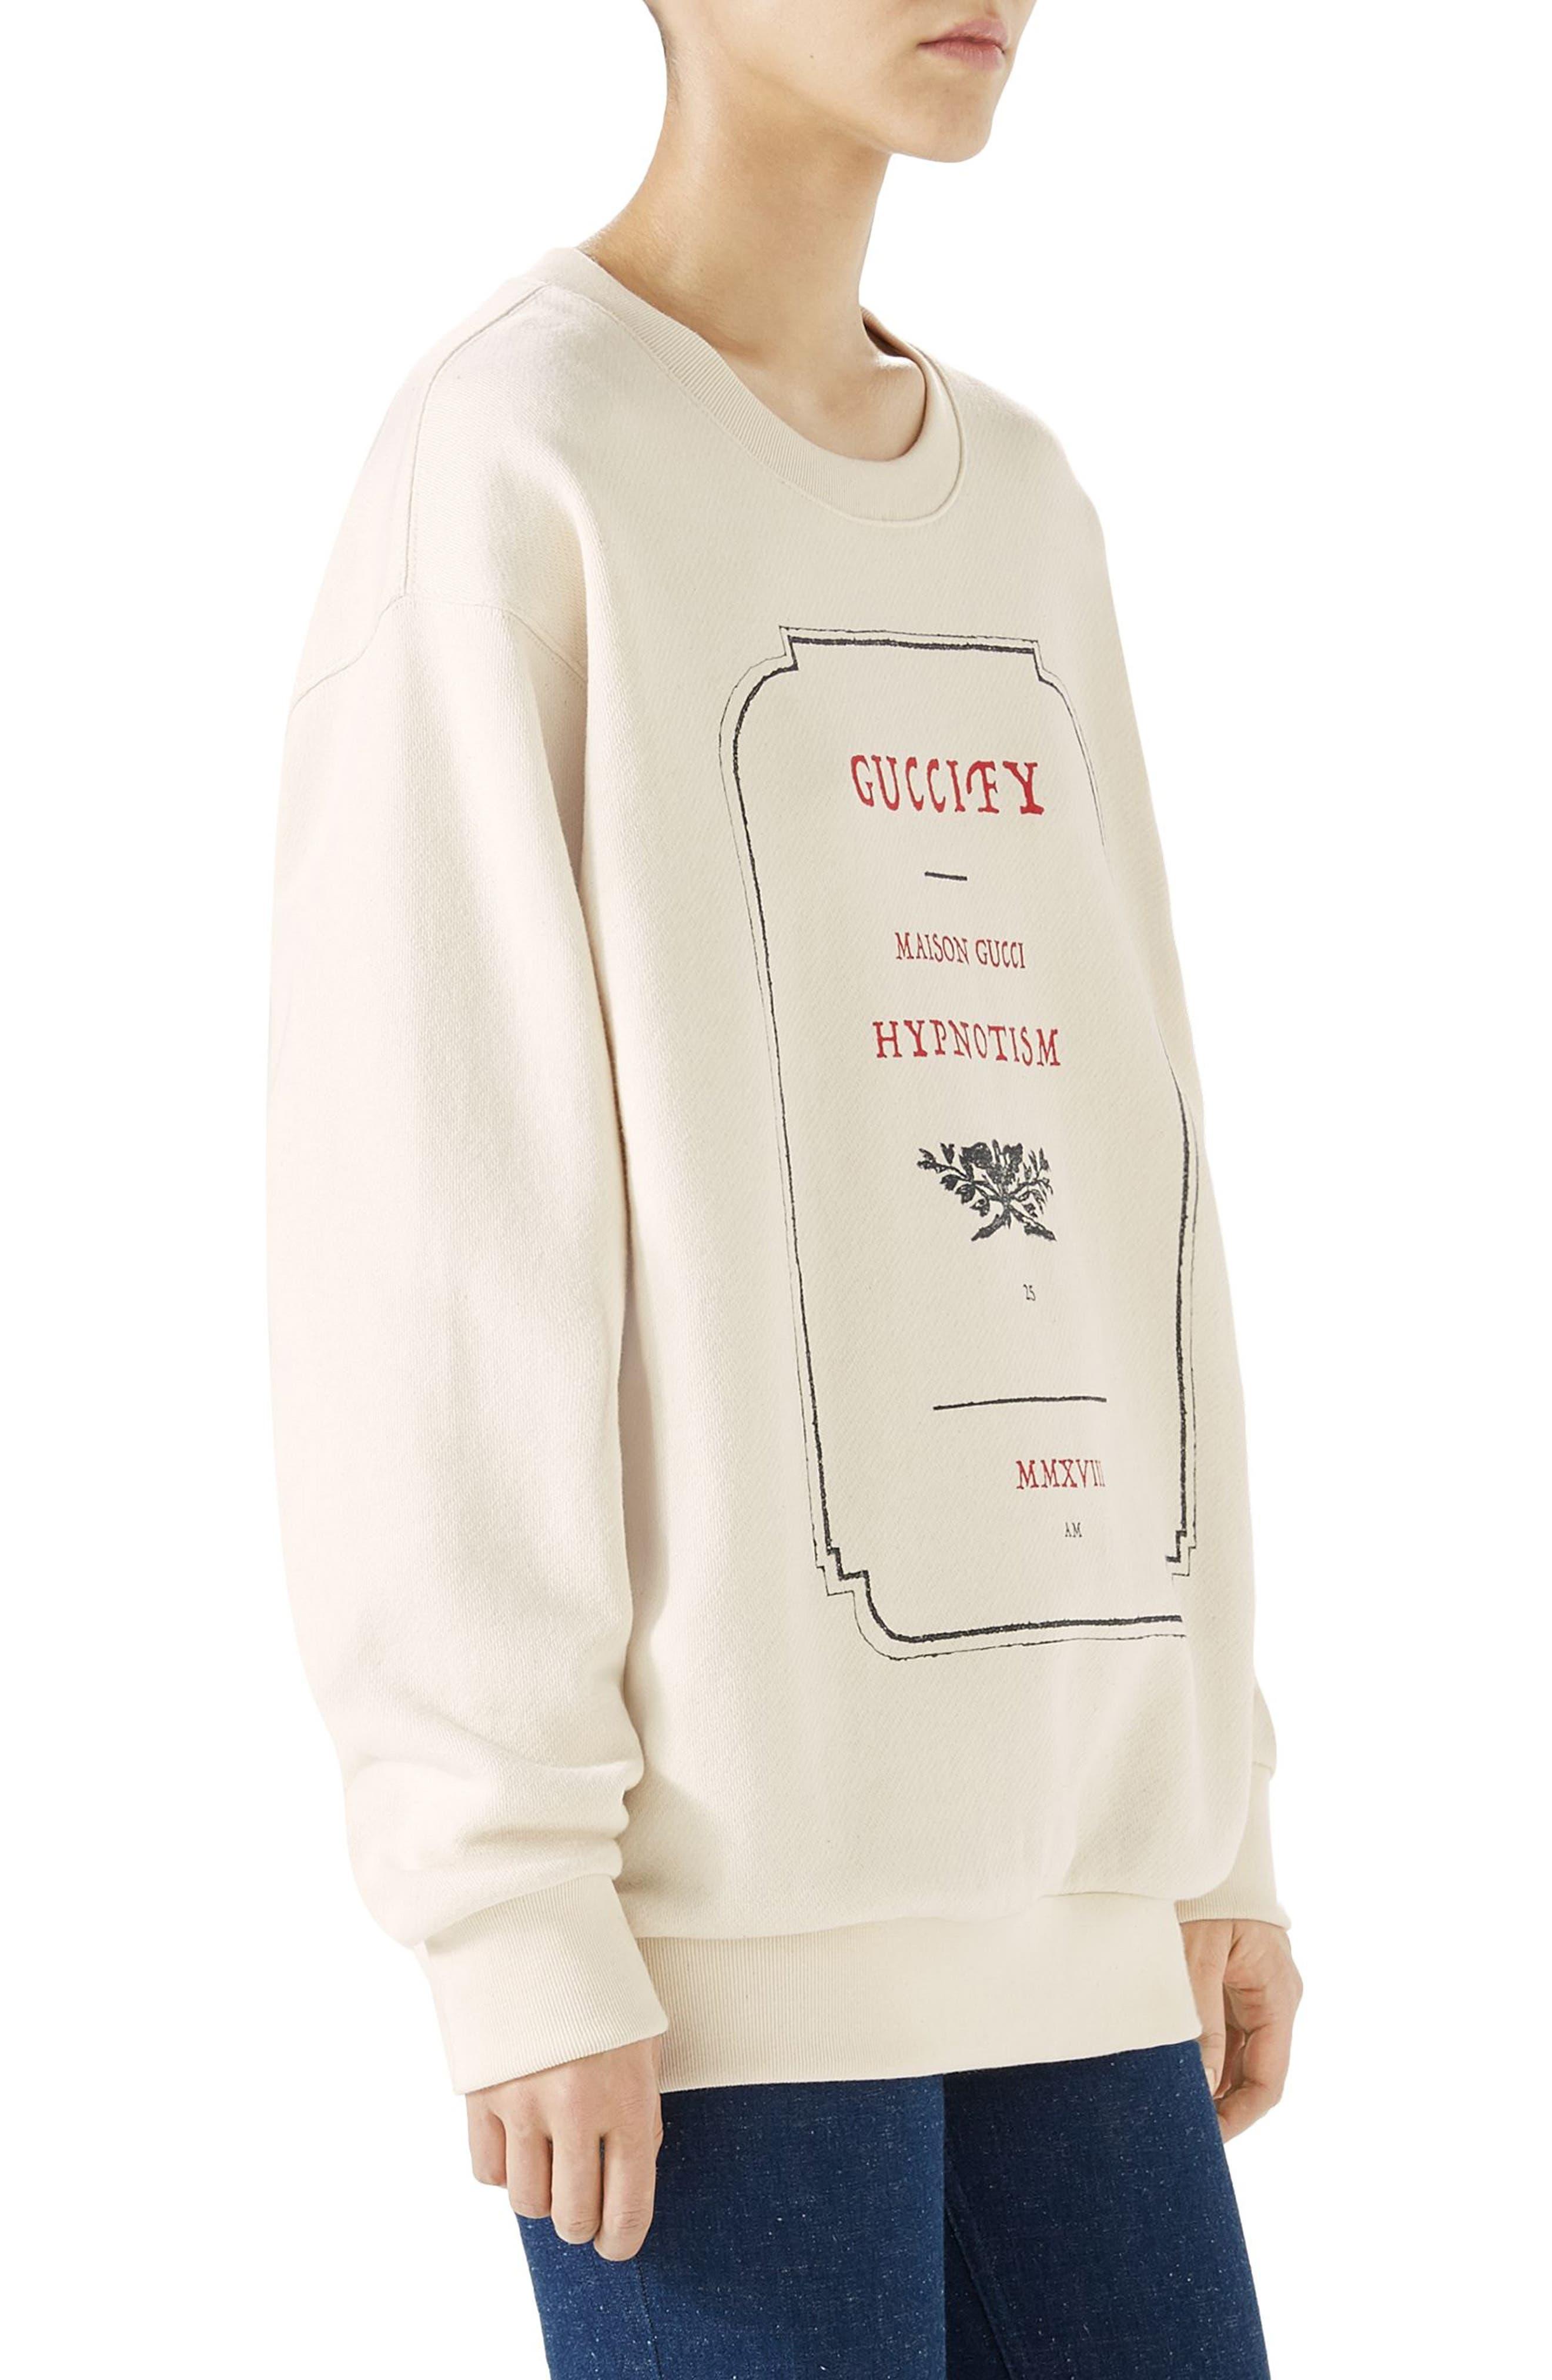 Hypnotism Graphic Sweatshirt,                             Alternate thumbnail 3, color,                             Natural White/ Multicolor